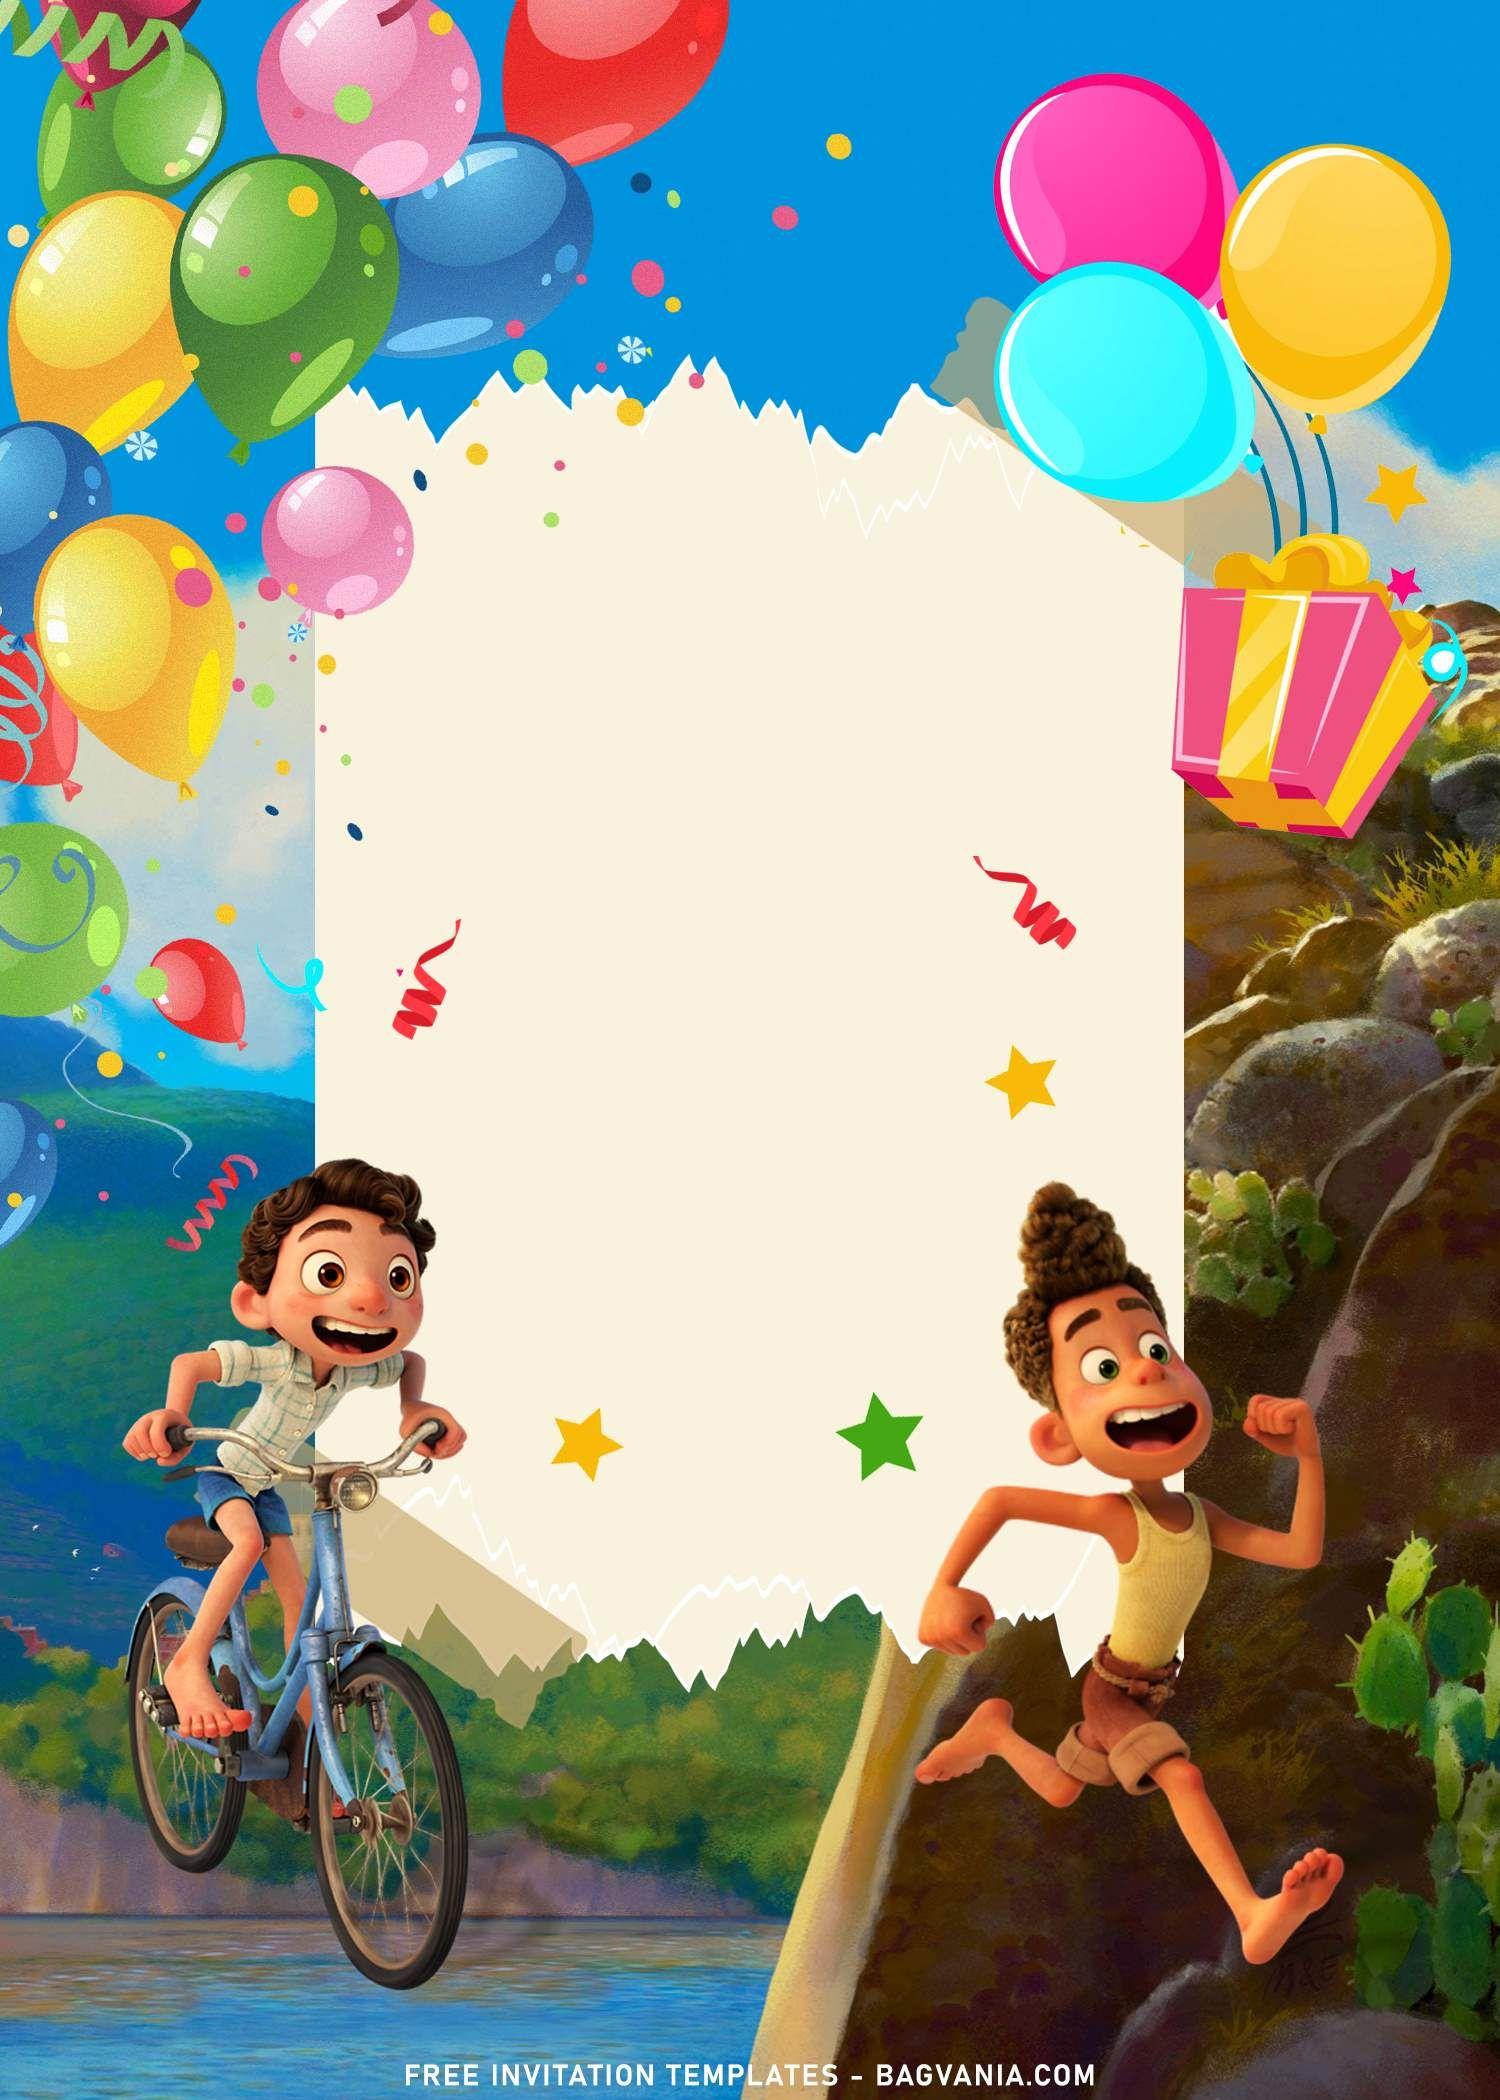 8 Disney Luca Birthday Invitation Templates For Your Kid S Birthday Party In 2021 Disney Invitations Kids Invitation Template Birthday Invitation Templates